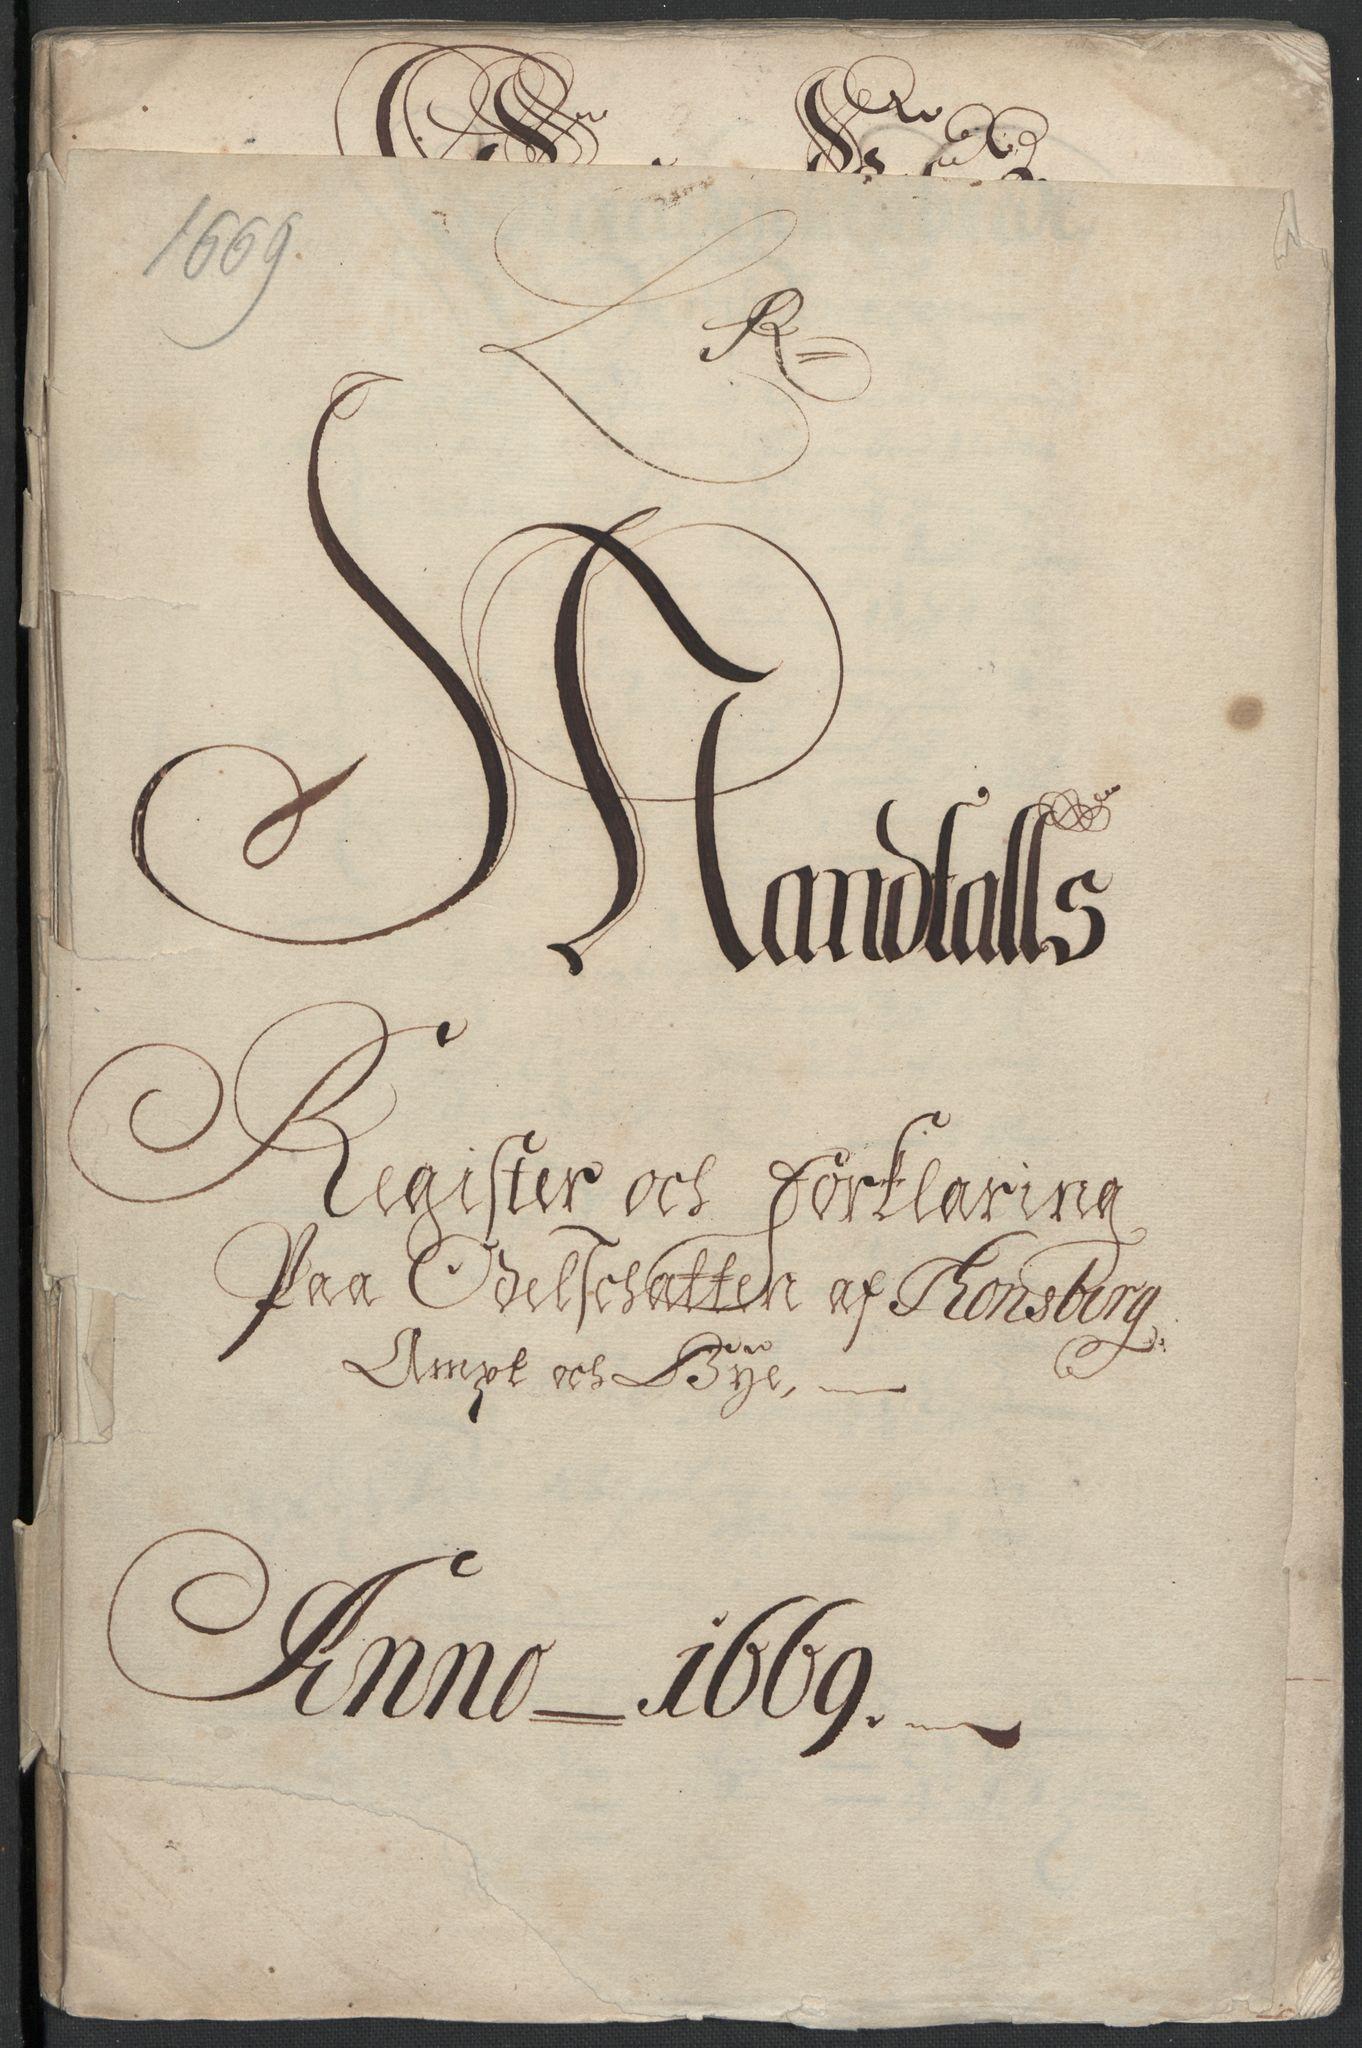 RA, Rentekammeret inntil 1814, Reviderte regnskaper, Fogderegnskap, R32/L1840: Fogderegnskap Jarlsberg grevskap, 1664-1673, s. 254